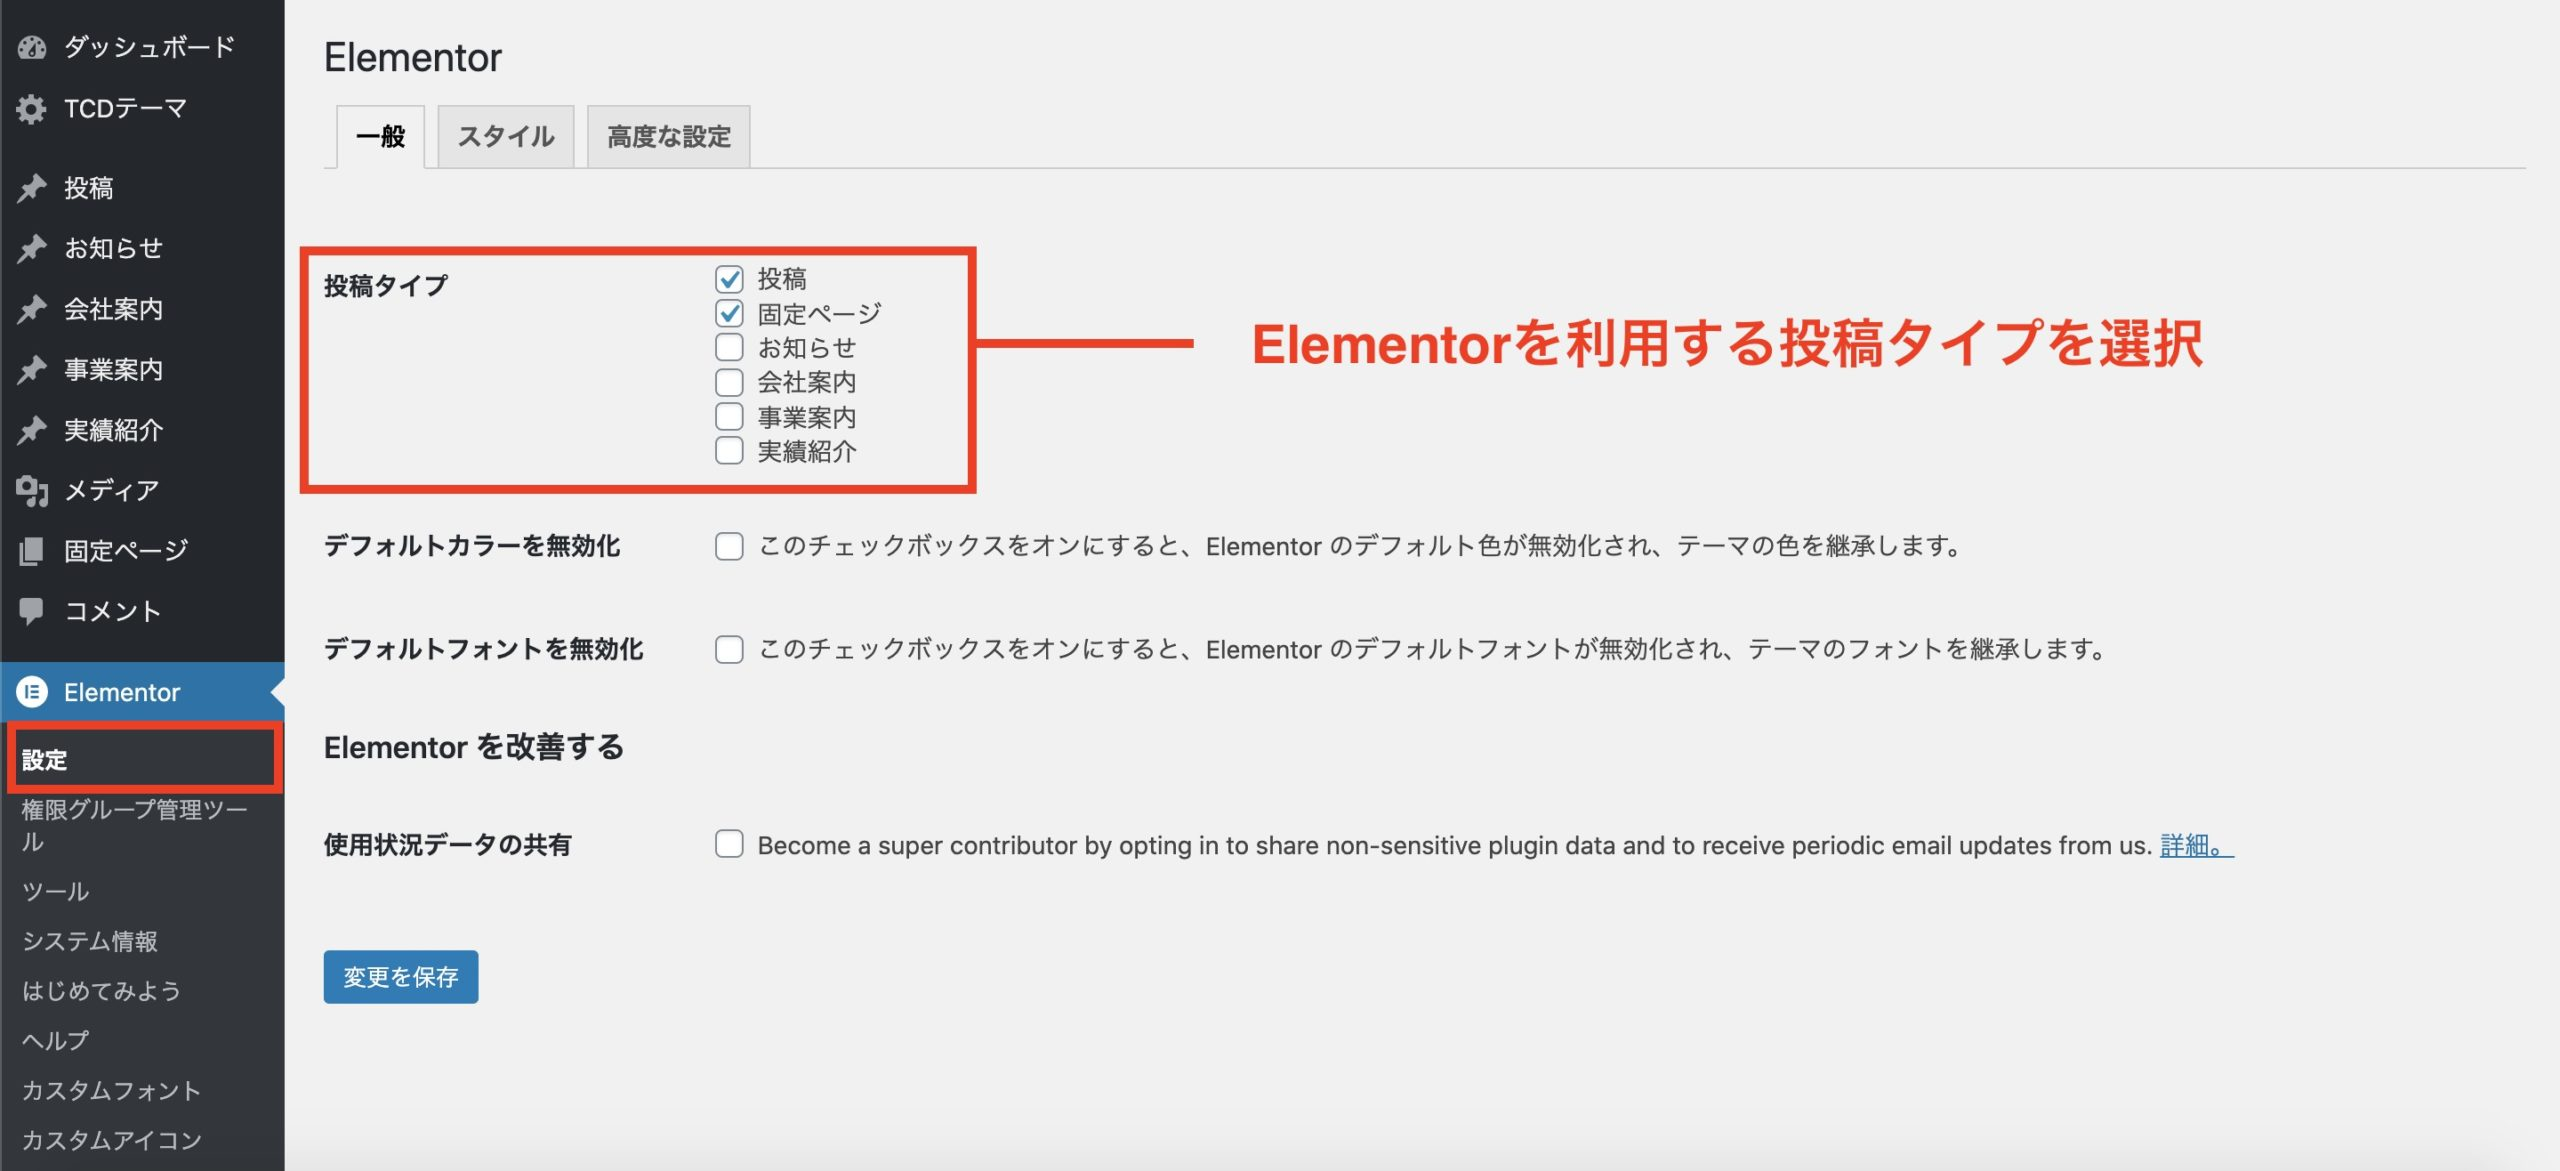 Elementorを利用する投稿タイプを選択